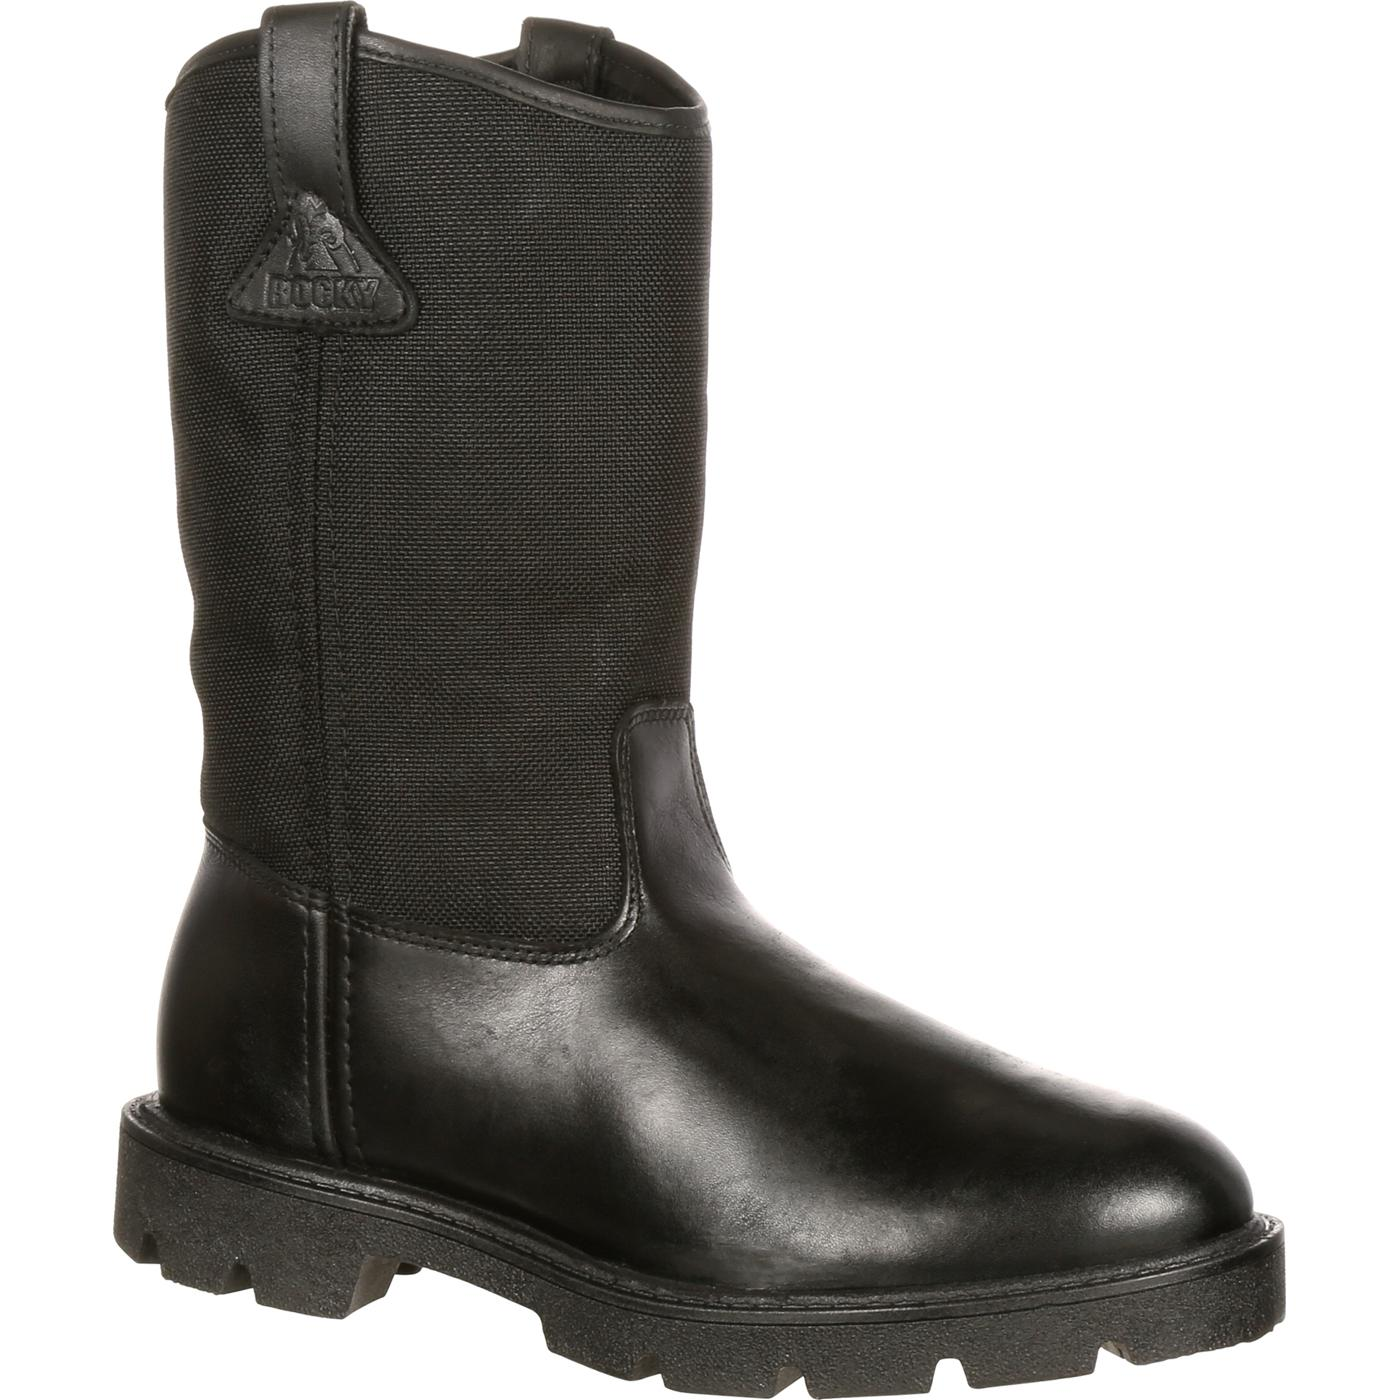 Warden Pull-On Wellington Duty Boot-Rocky Boots